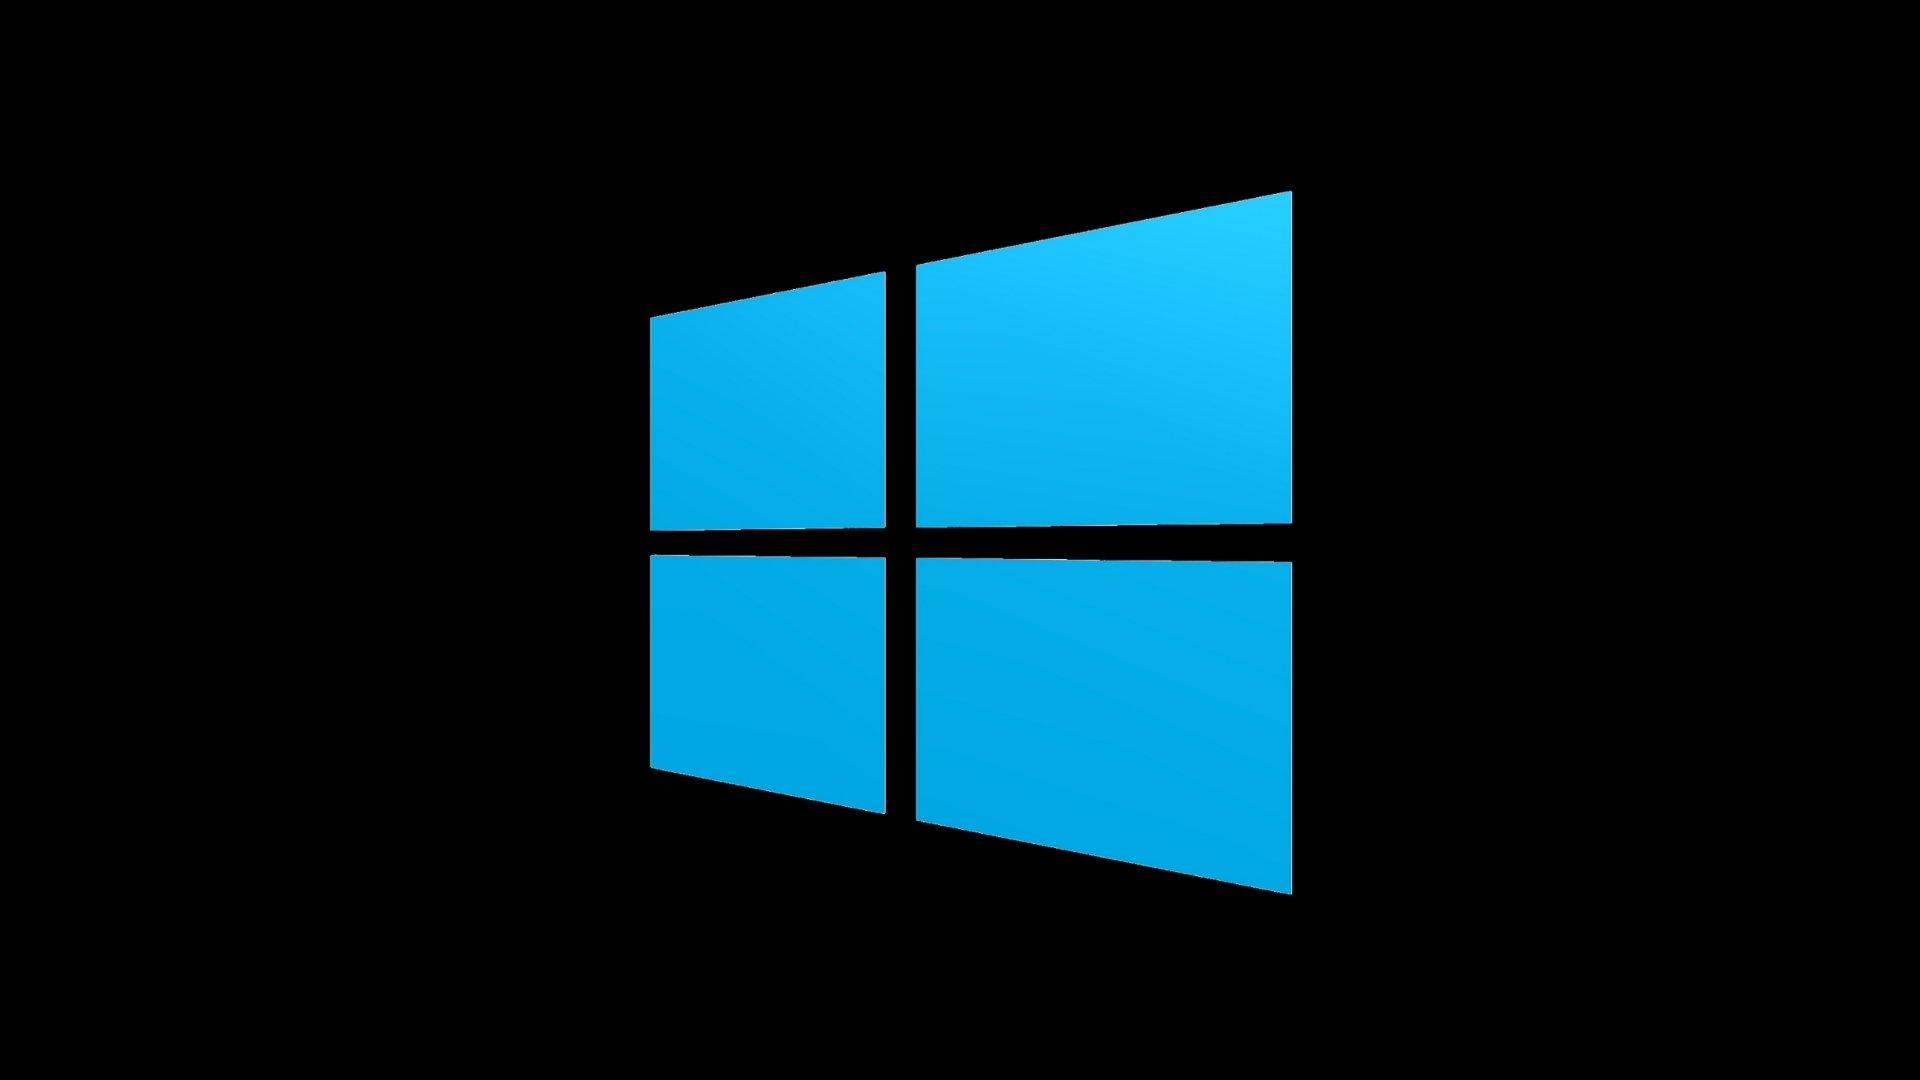 46+] Windows 10 Logo HD Wallpaper on WallpaperSafari